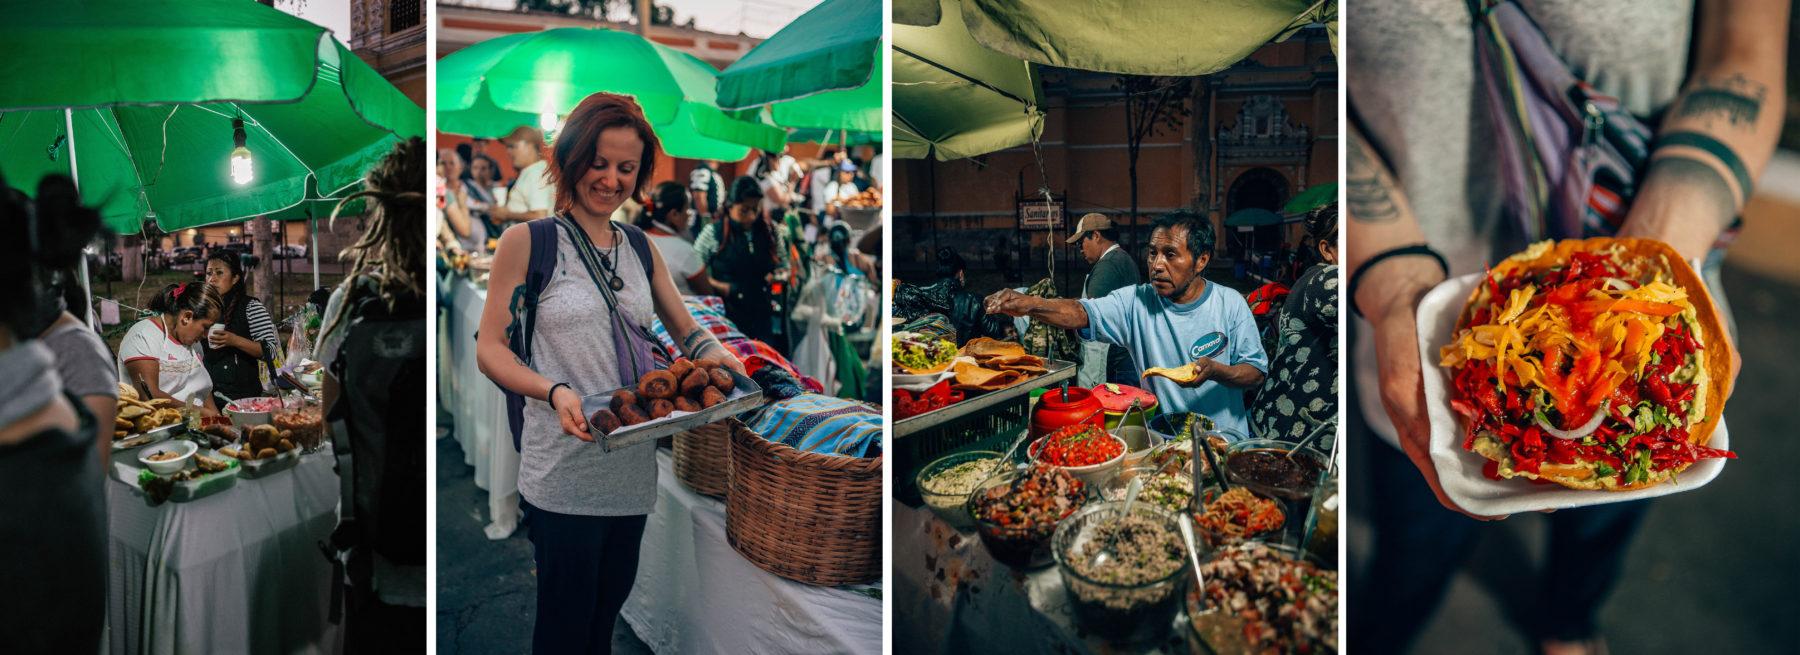 guatemala colourful healthy vegan food authentic vegan version of tacos antigua samsara cruelty free street food